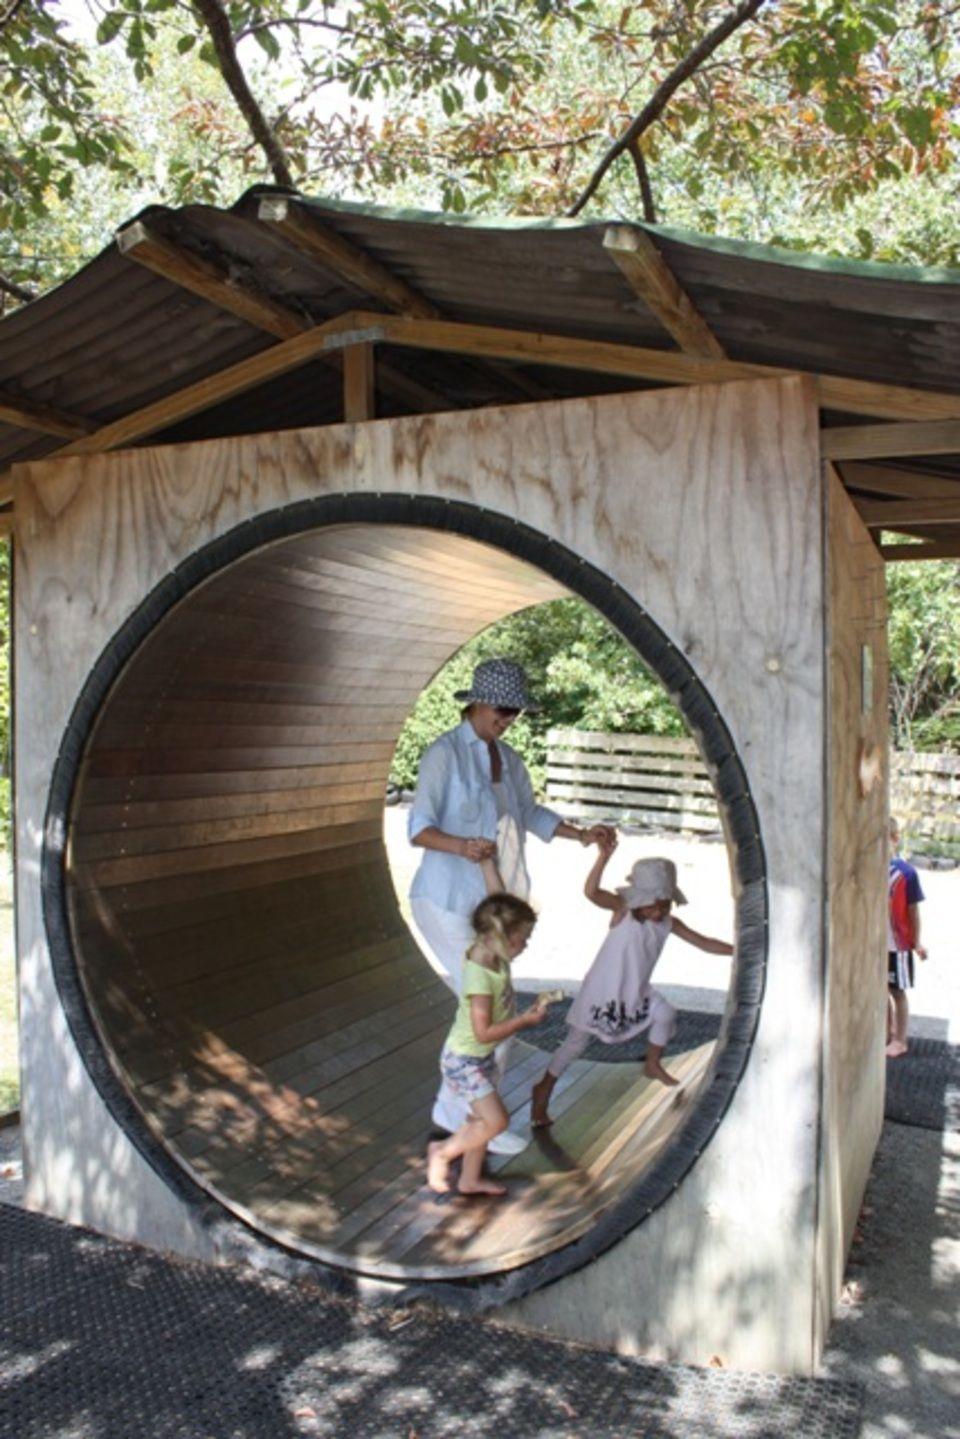 Human Hamster Wheel! Waterworks, Outdoor bed, Travel reviews